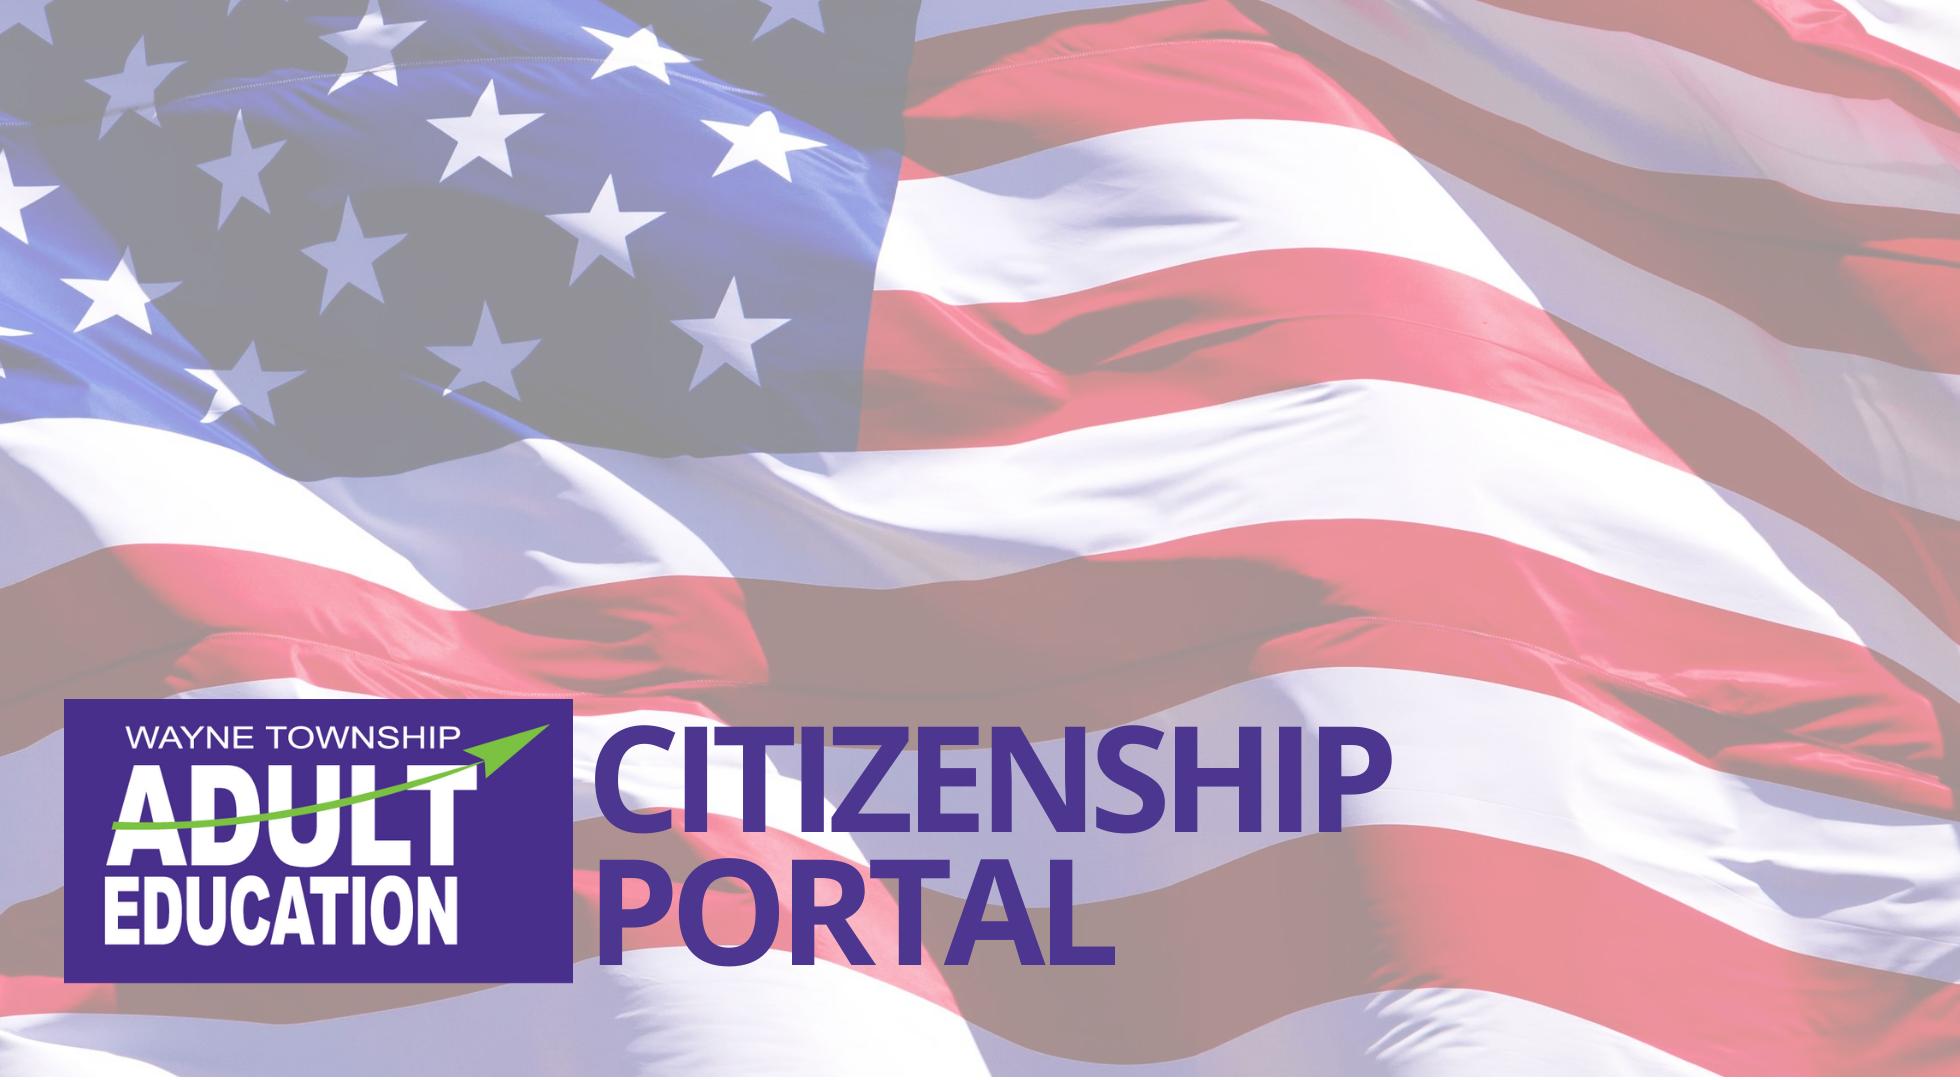 Citizenship Portal